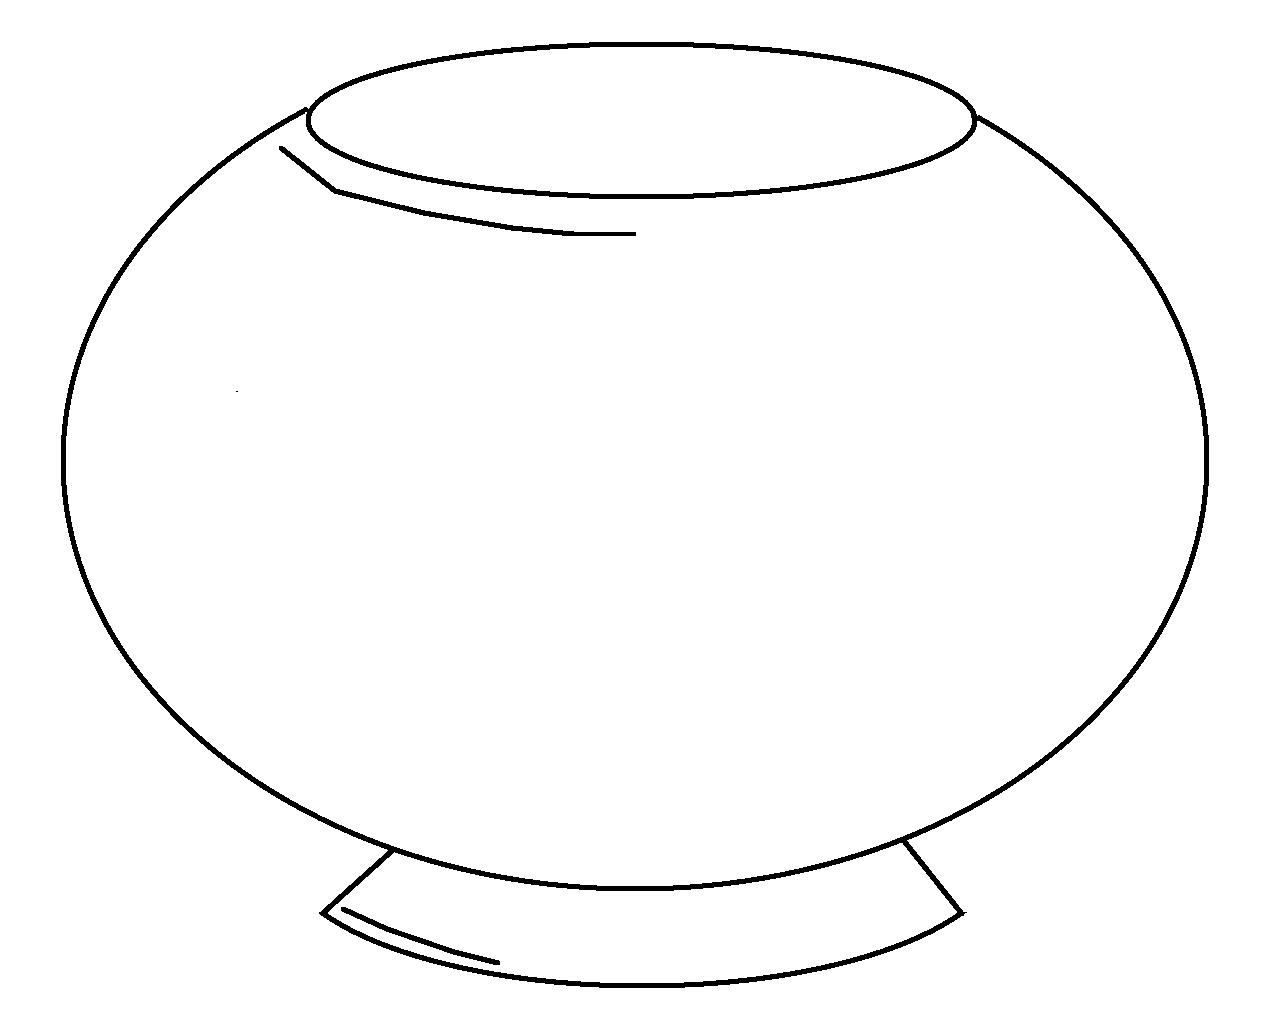 Free fish bowl coloring. Fishbowl clipart empty vase